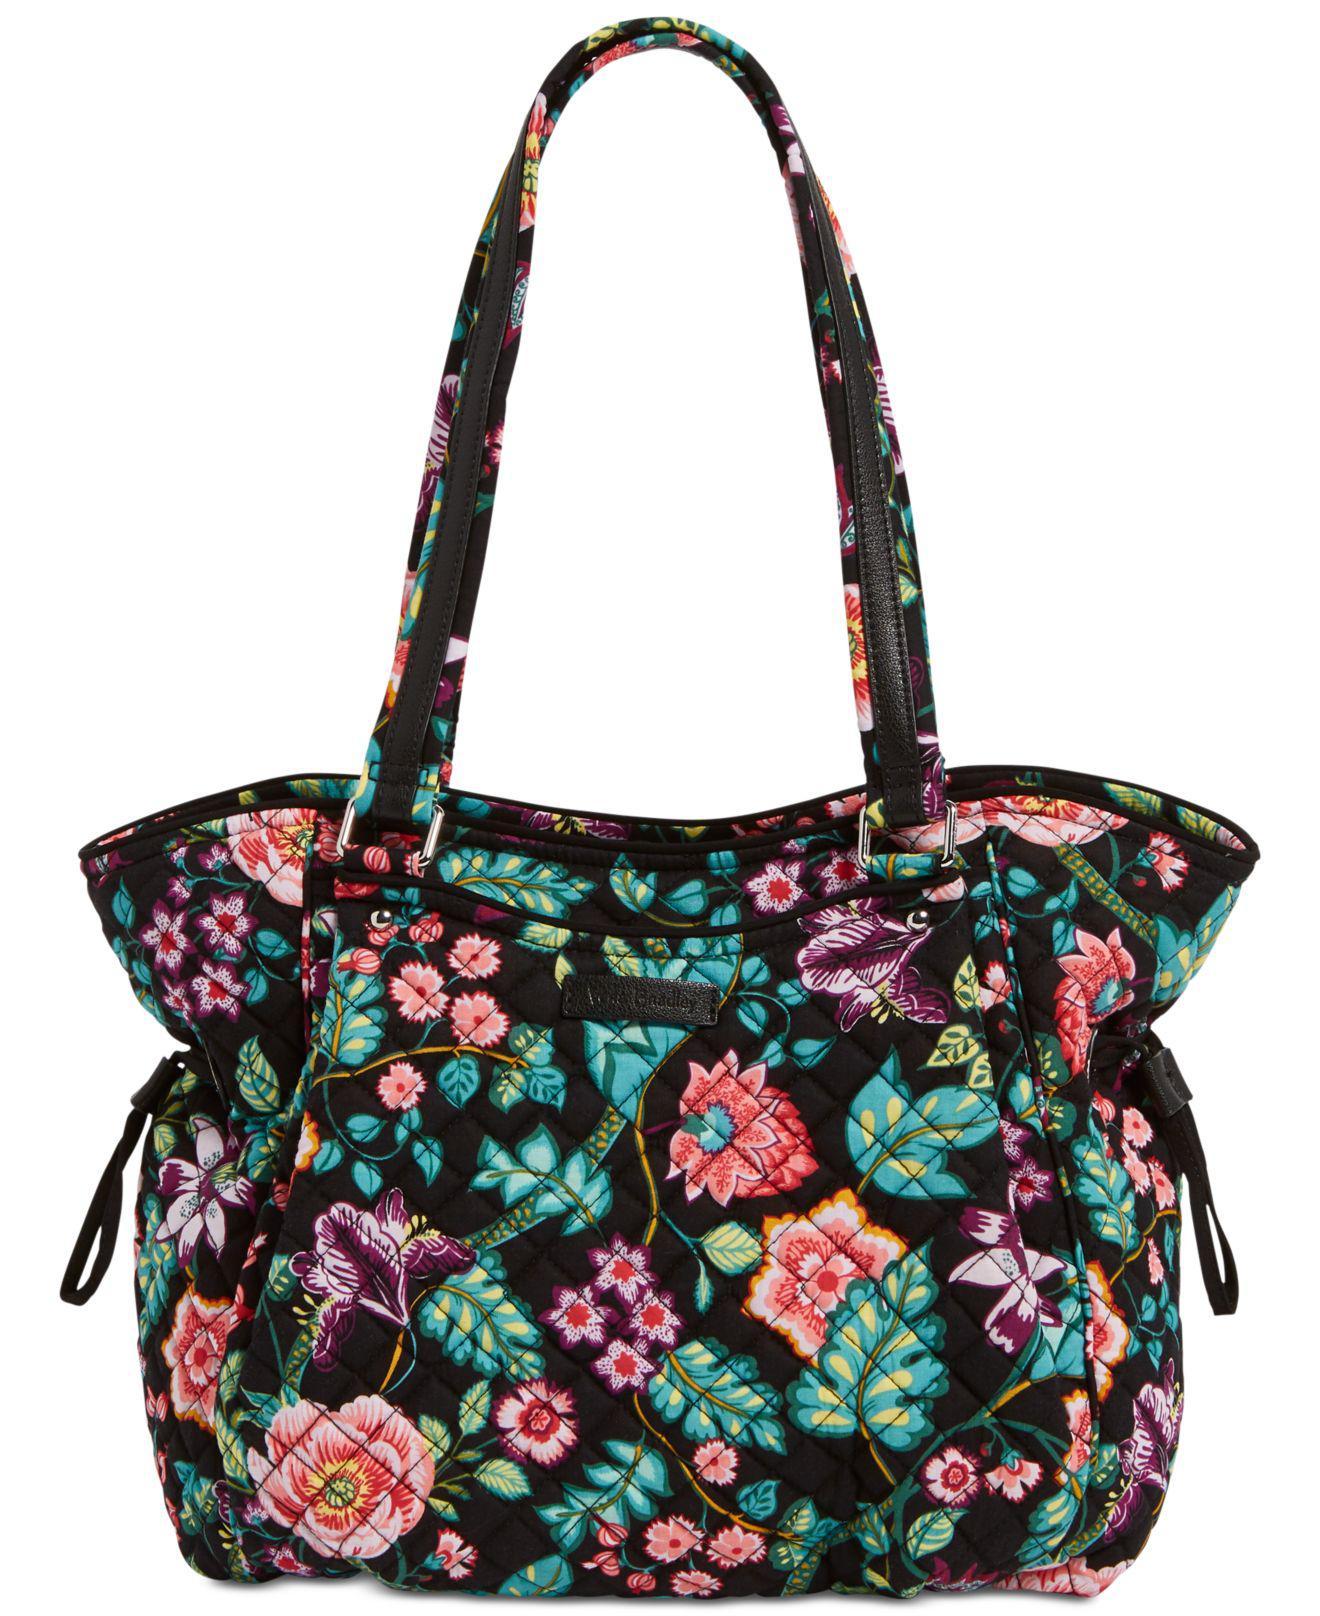 Lyst - Vera Bradley Iconic Glenna Small Shoulder Bag - Save ... a0eb4812e6542